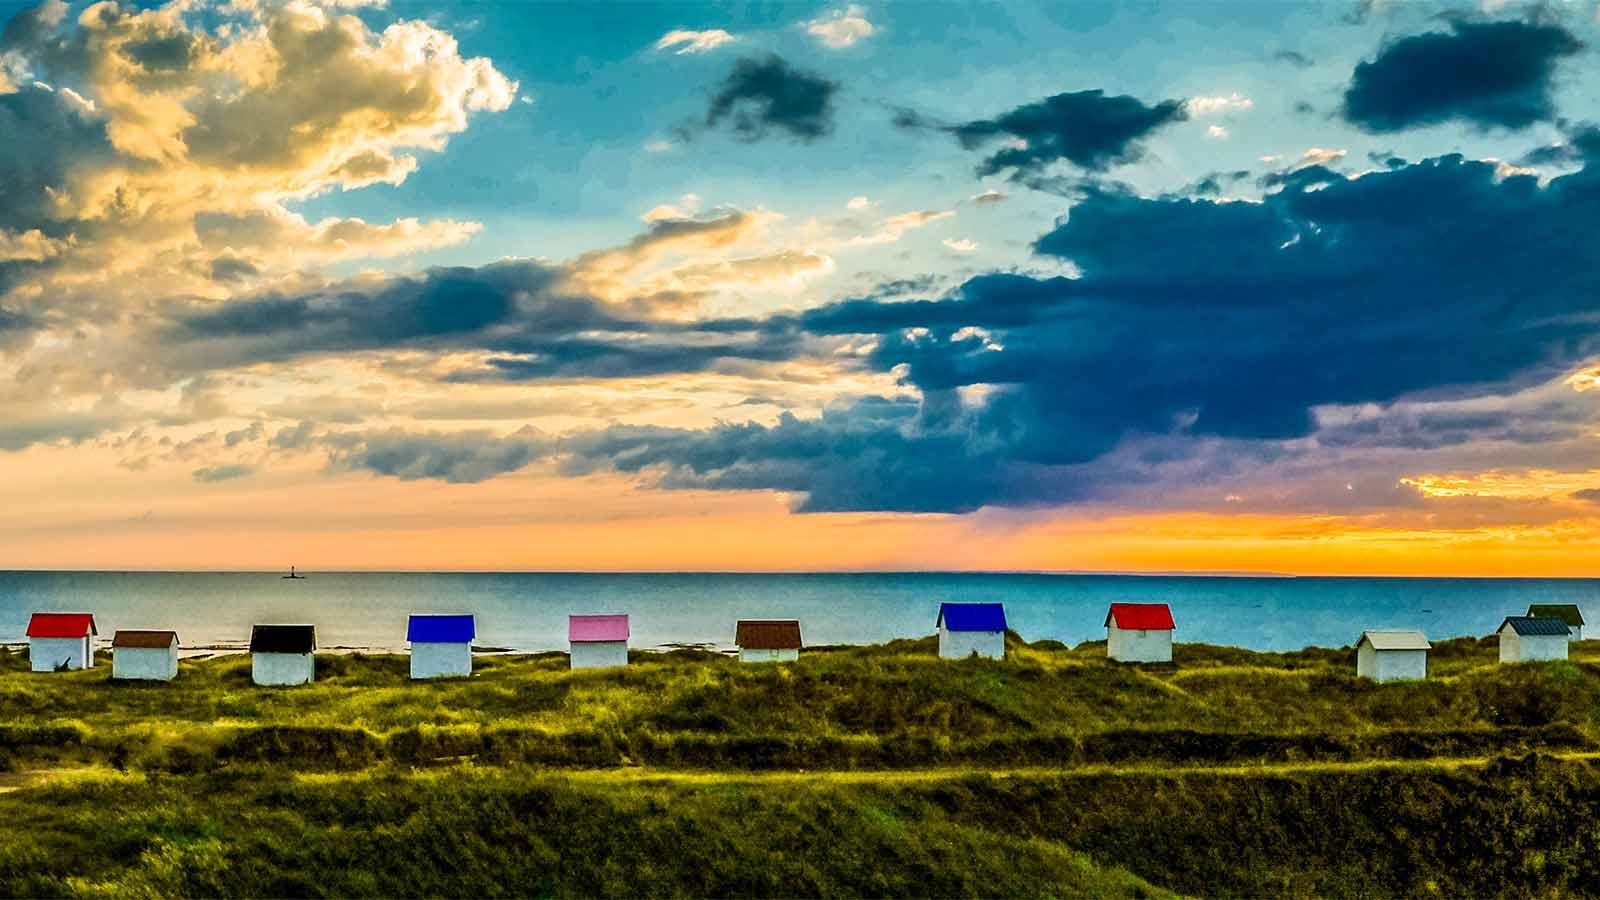 Camping manche gouville sur mer location vacances for Camping basse normandie bord de mer avec piscine